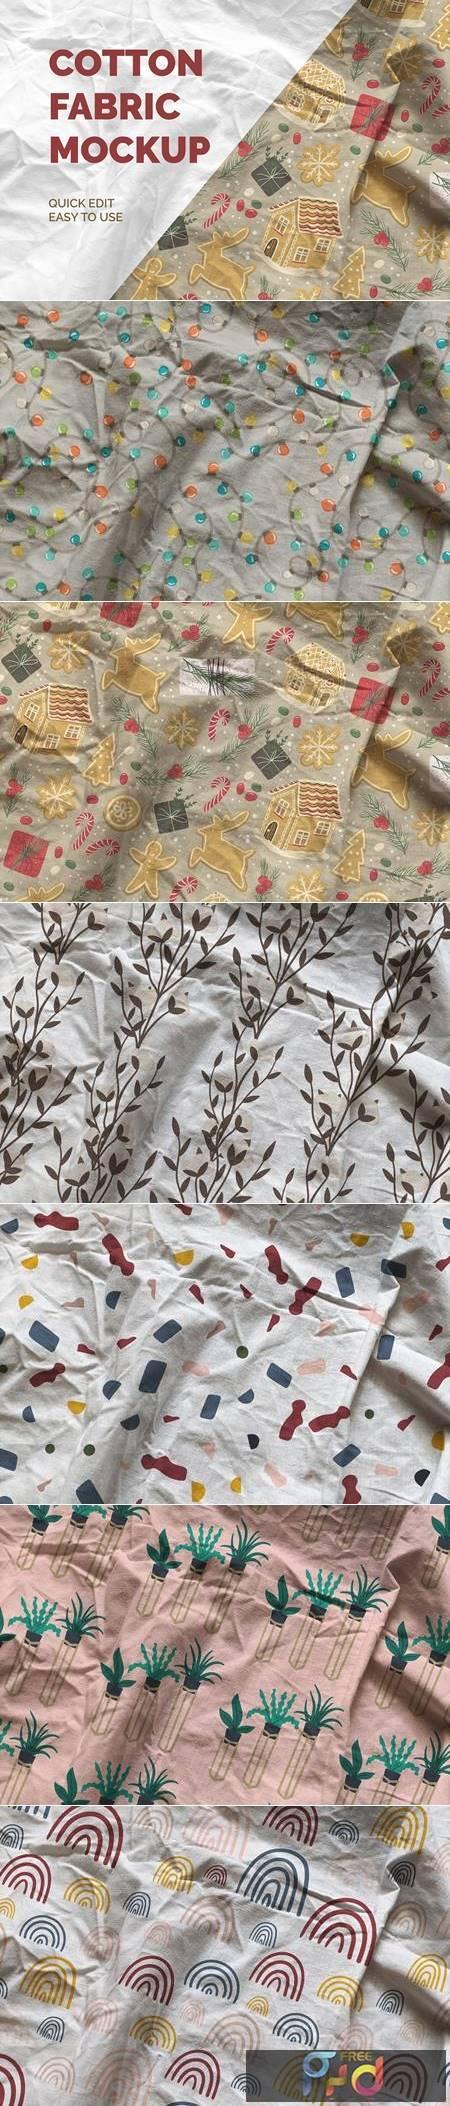 Cotton Fabric Mockup 5632631 1